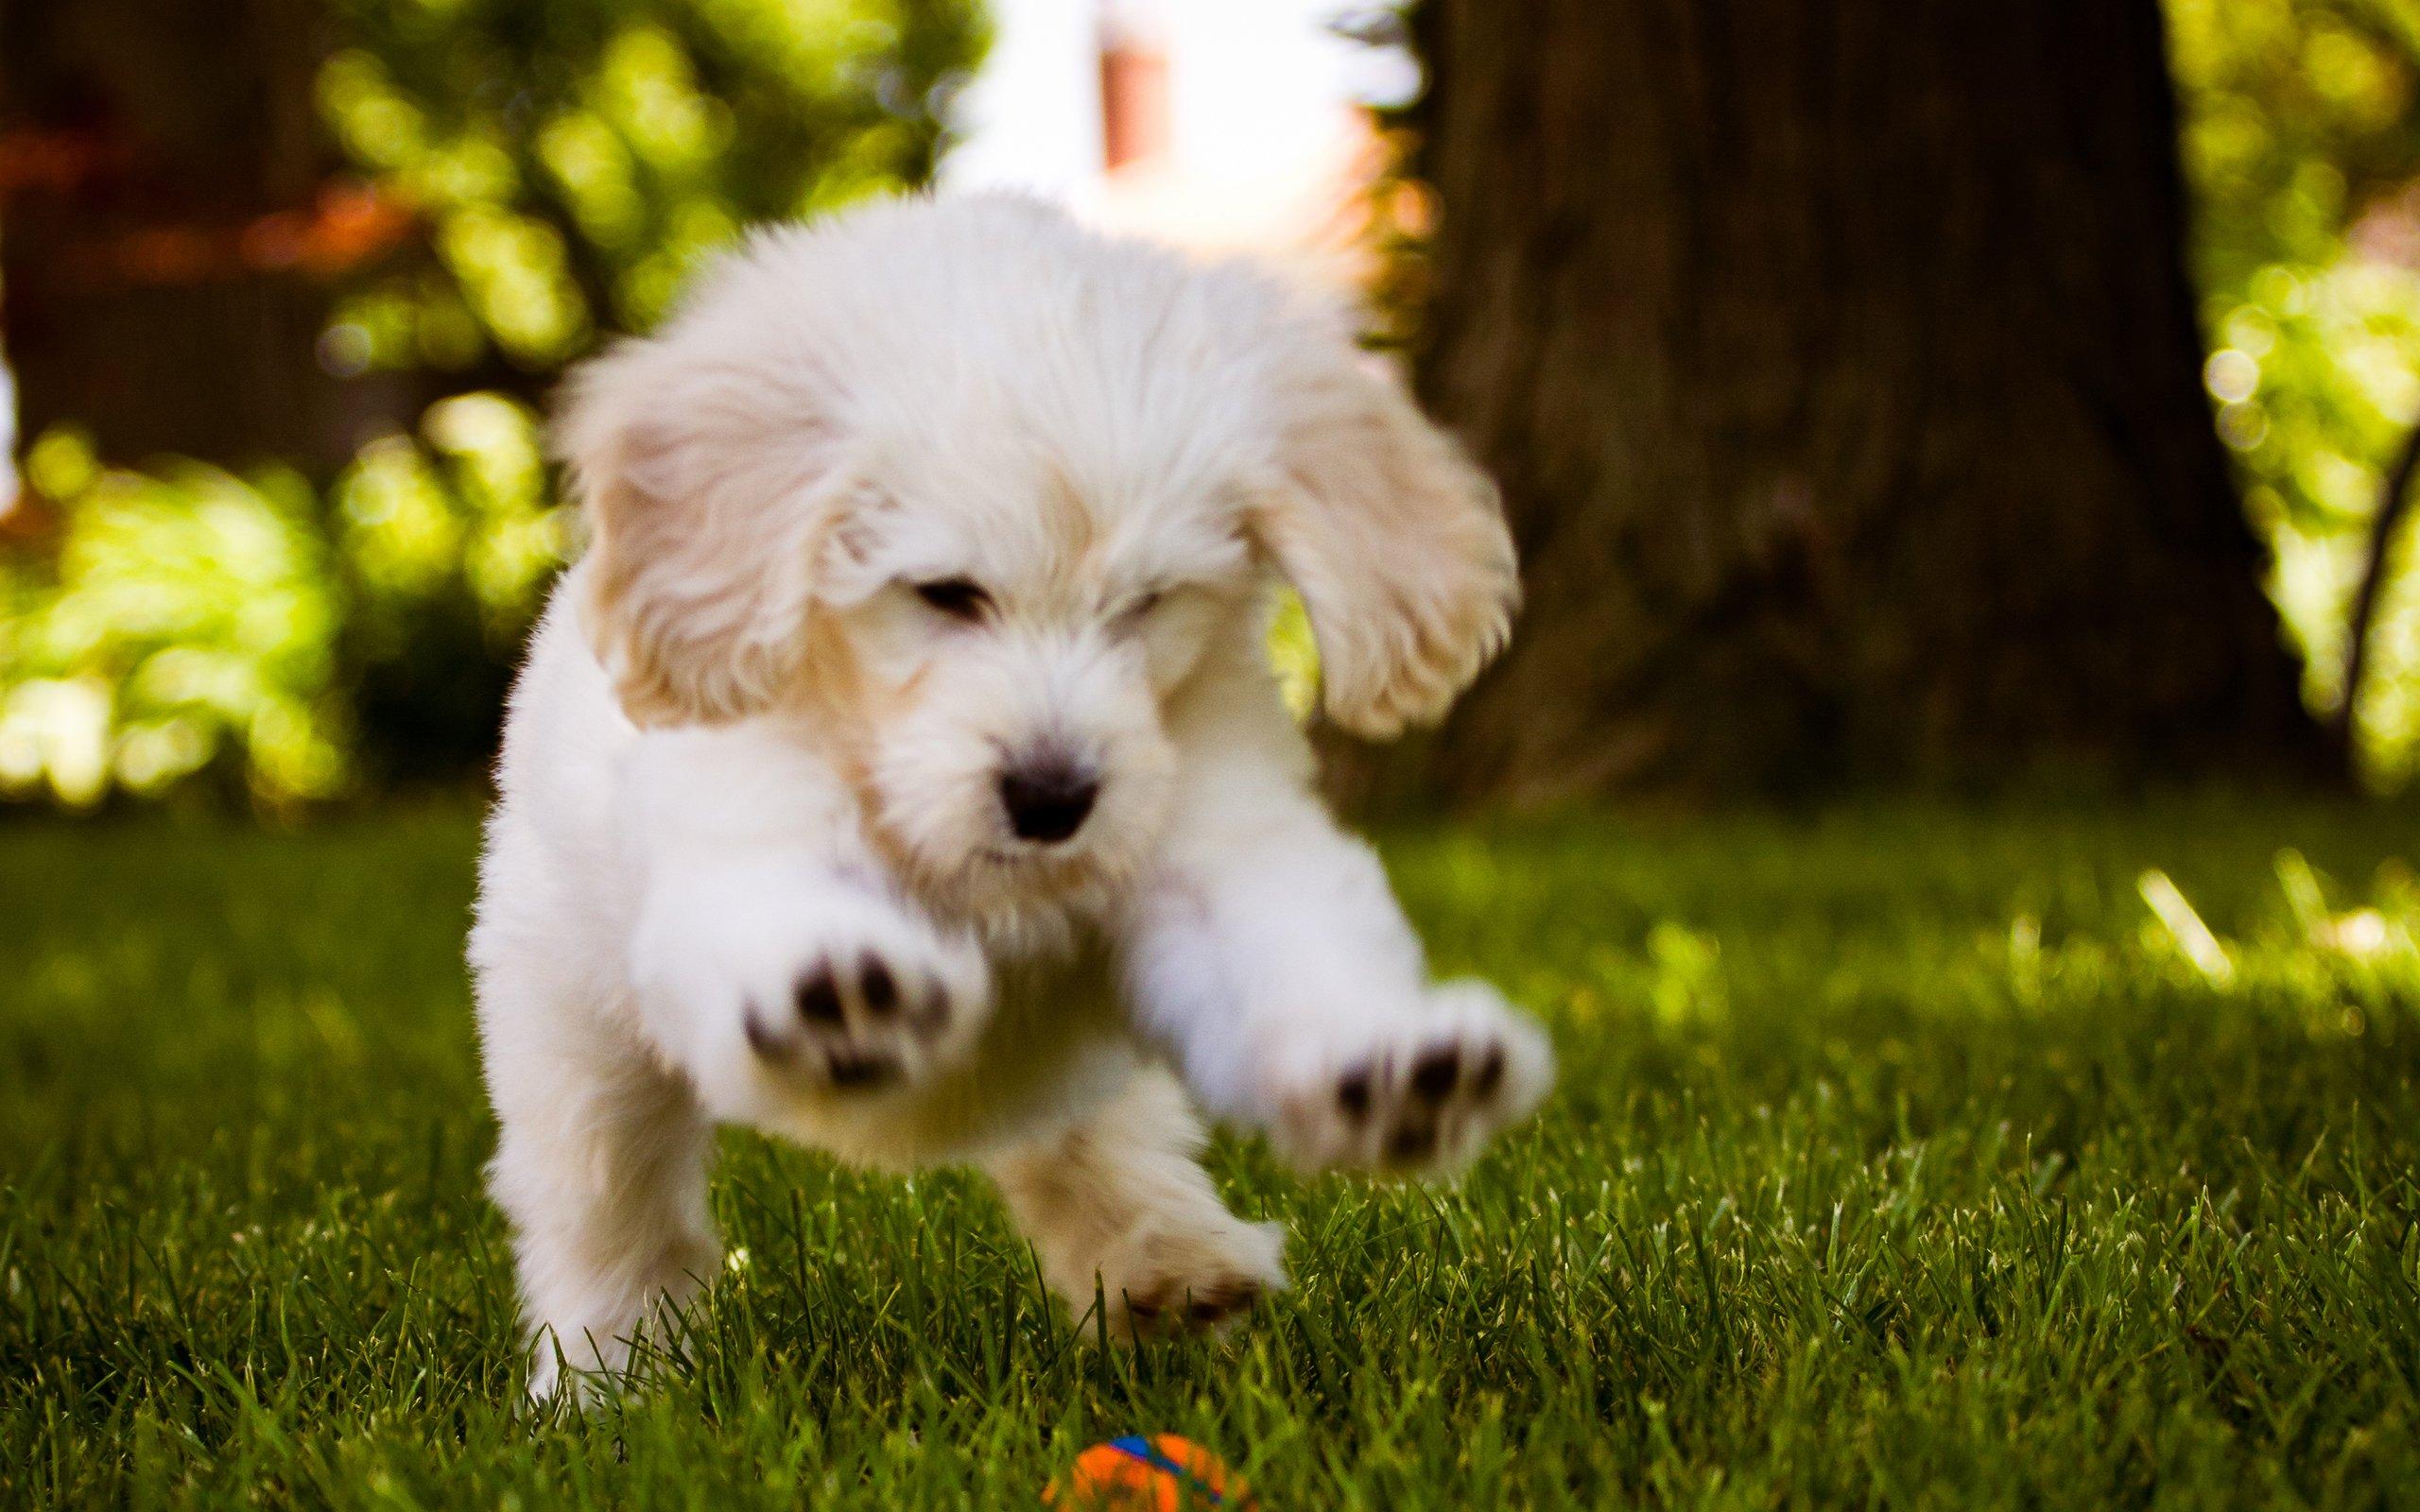 Wallpaper Little Dog Playing In The Wood HD Wallpaper Desktop 2560x1600